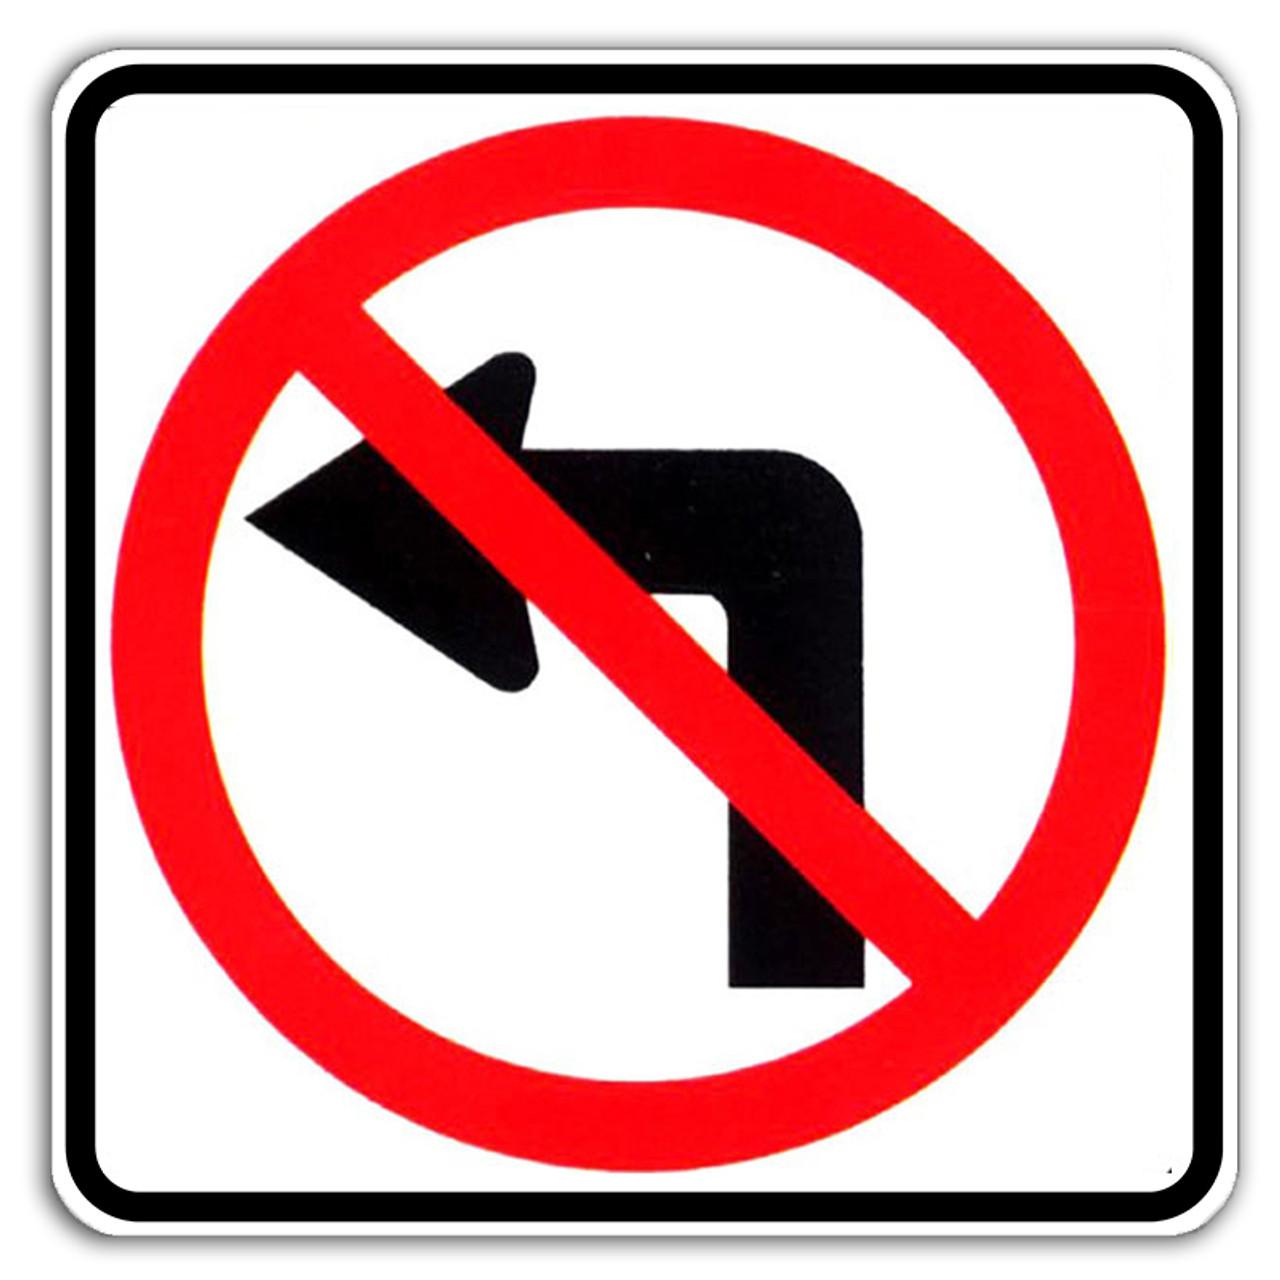 R3 2 Sign >> R3 2 No Left Turn Sign